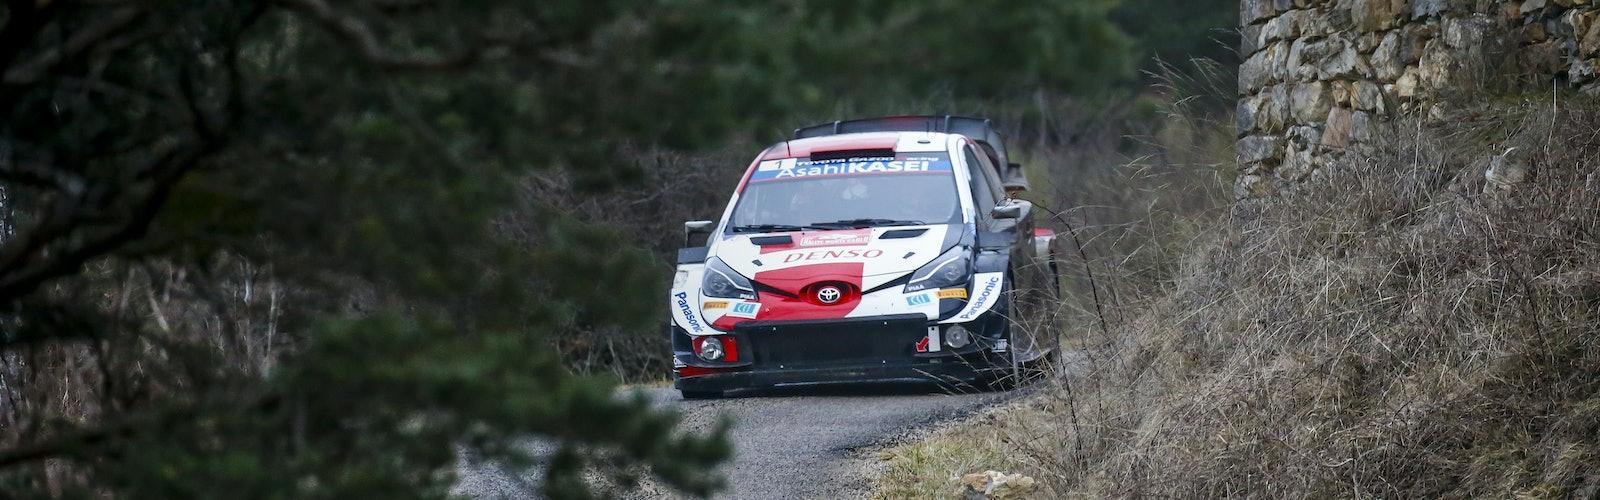 WRC_2021_Rd1._172